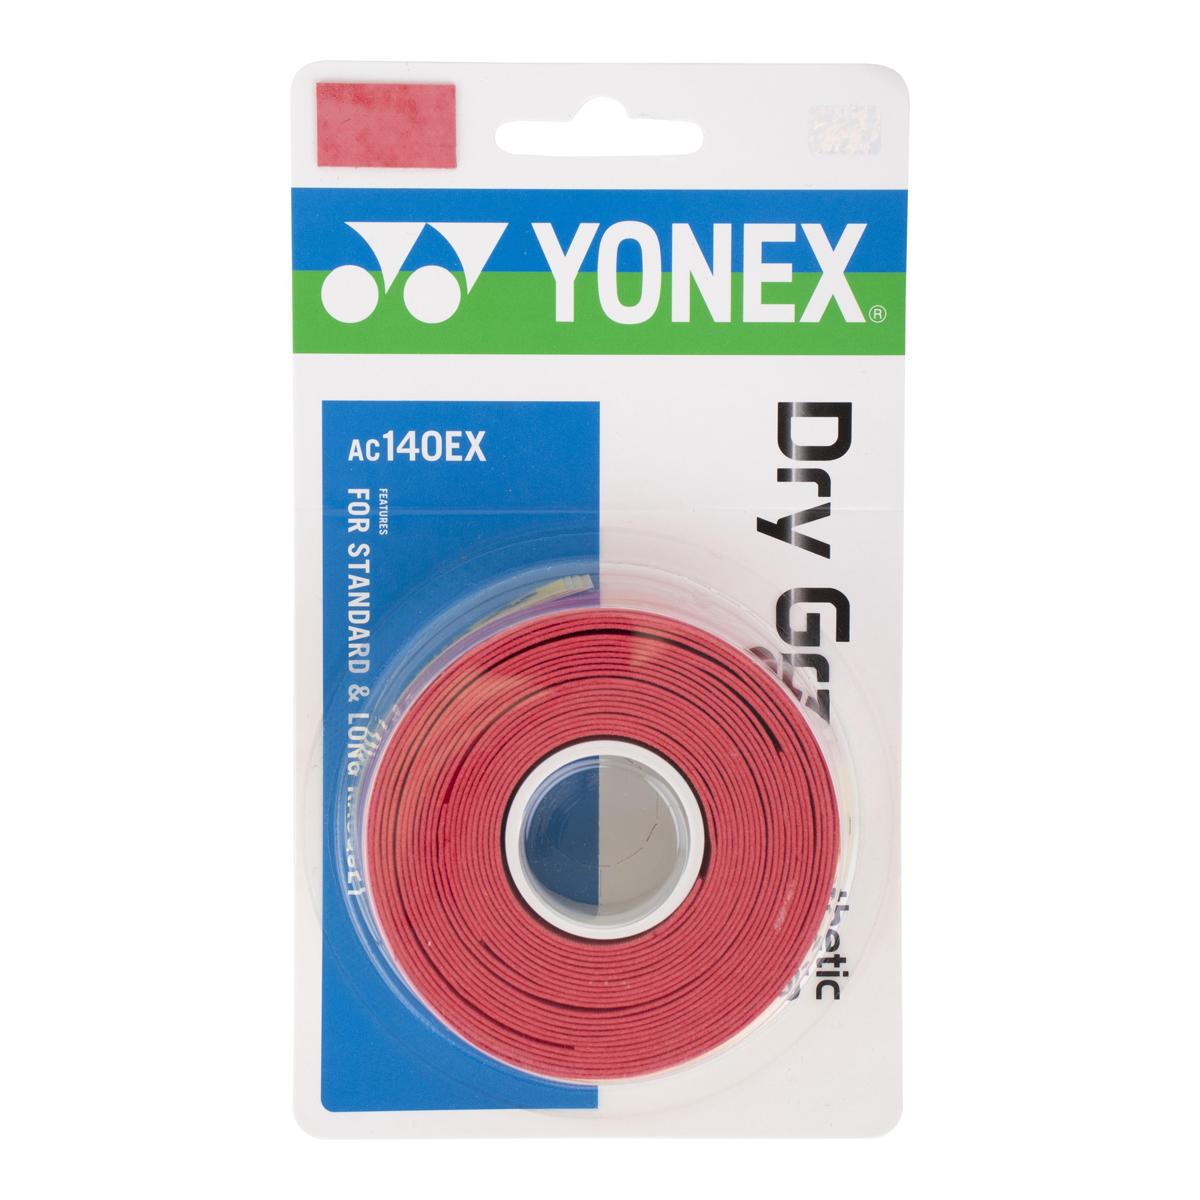 Griffband - YONEX - DRY GRAP AC140Detailbild - 0